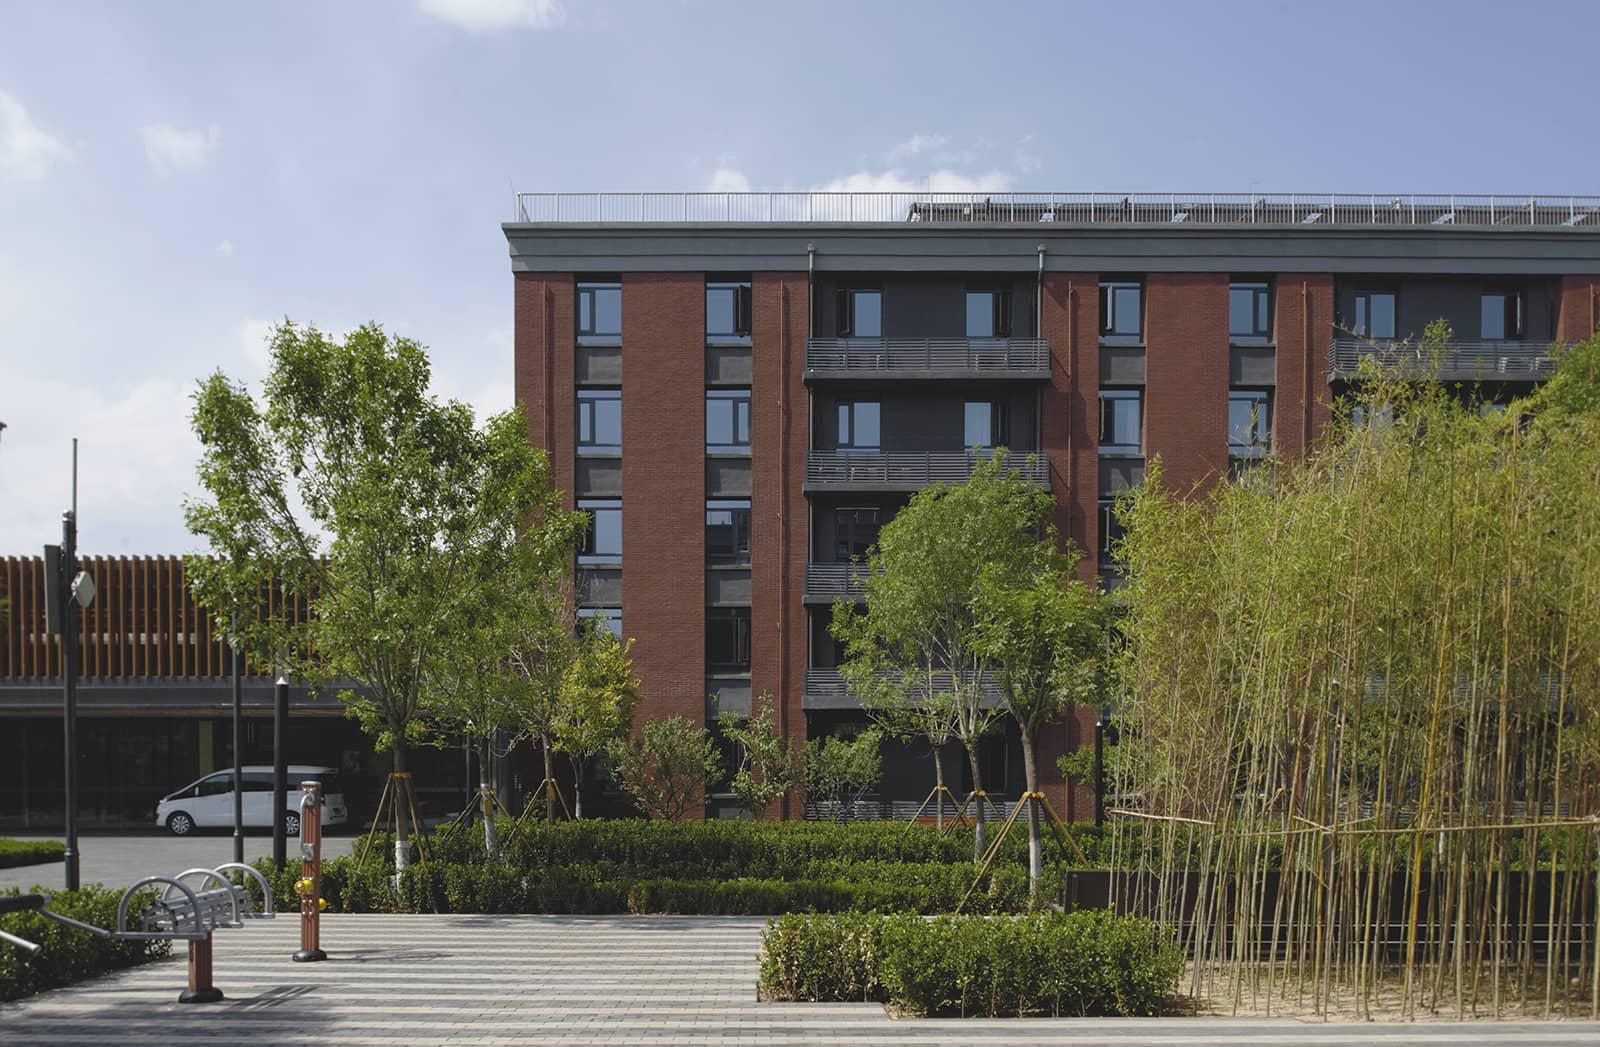 Facade Renovation Project - Vanke Suiyuan Elderly Care Center